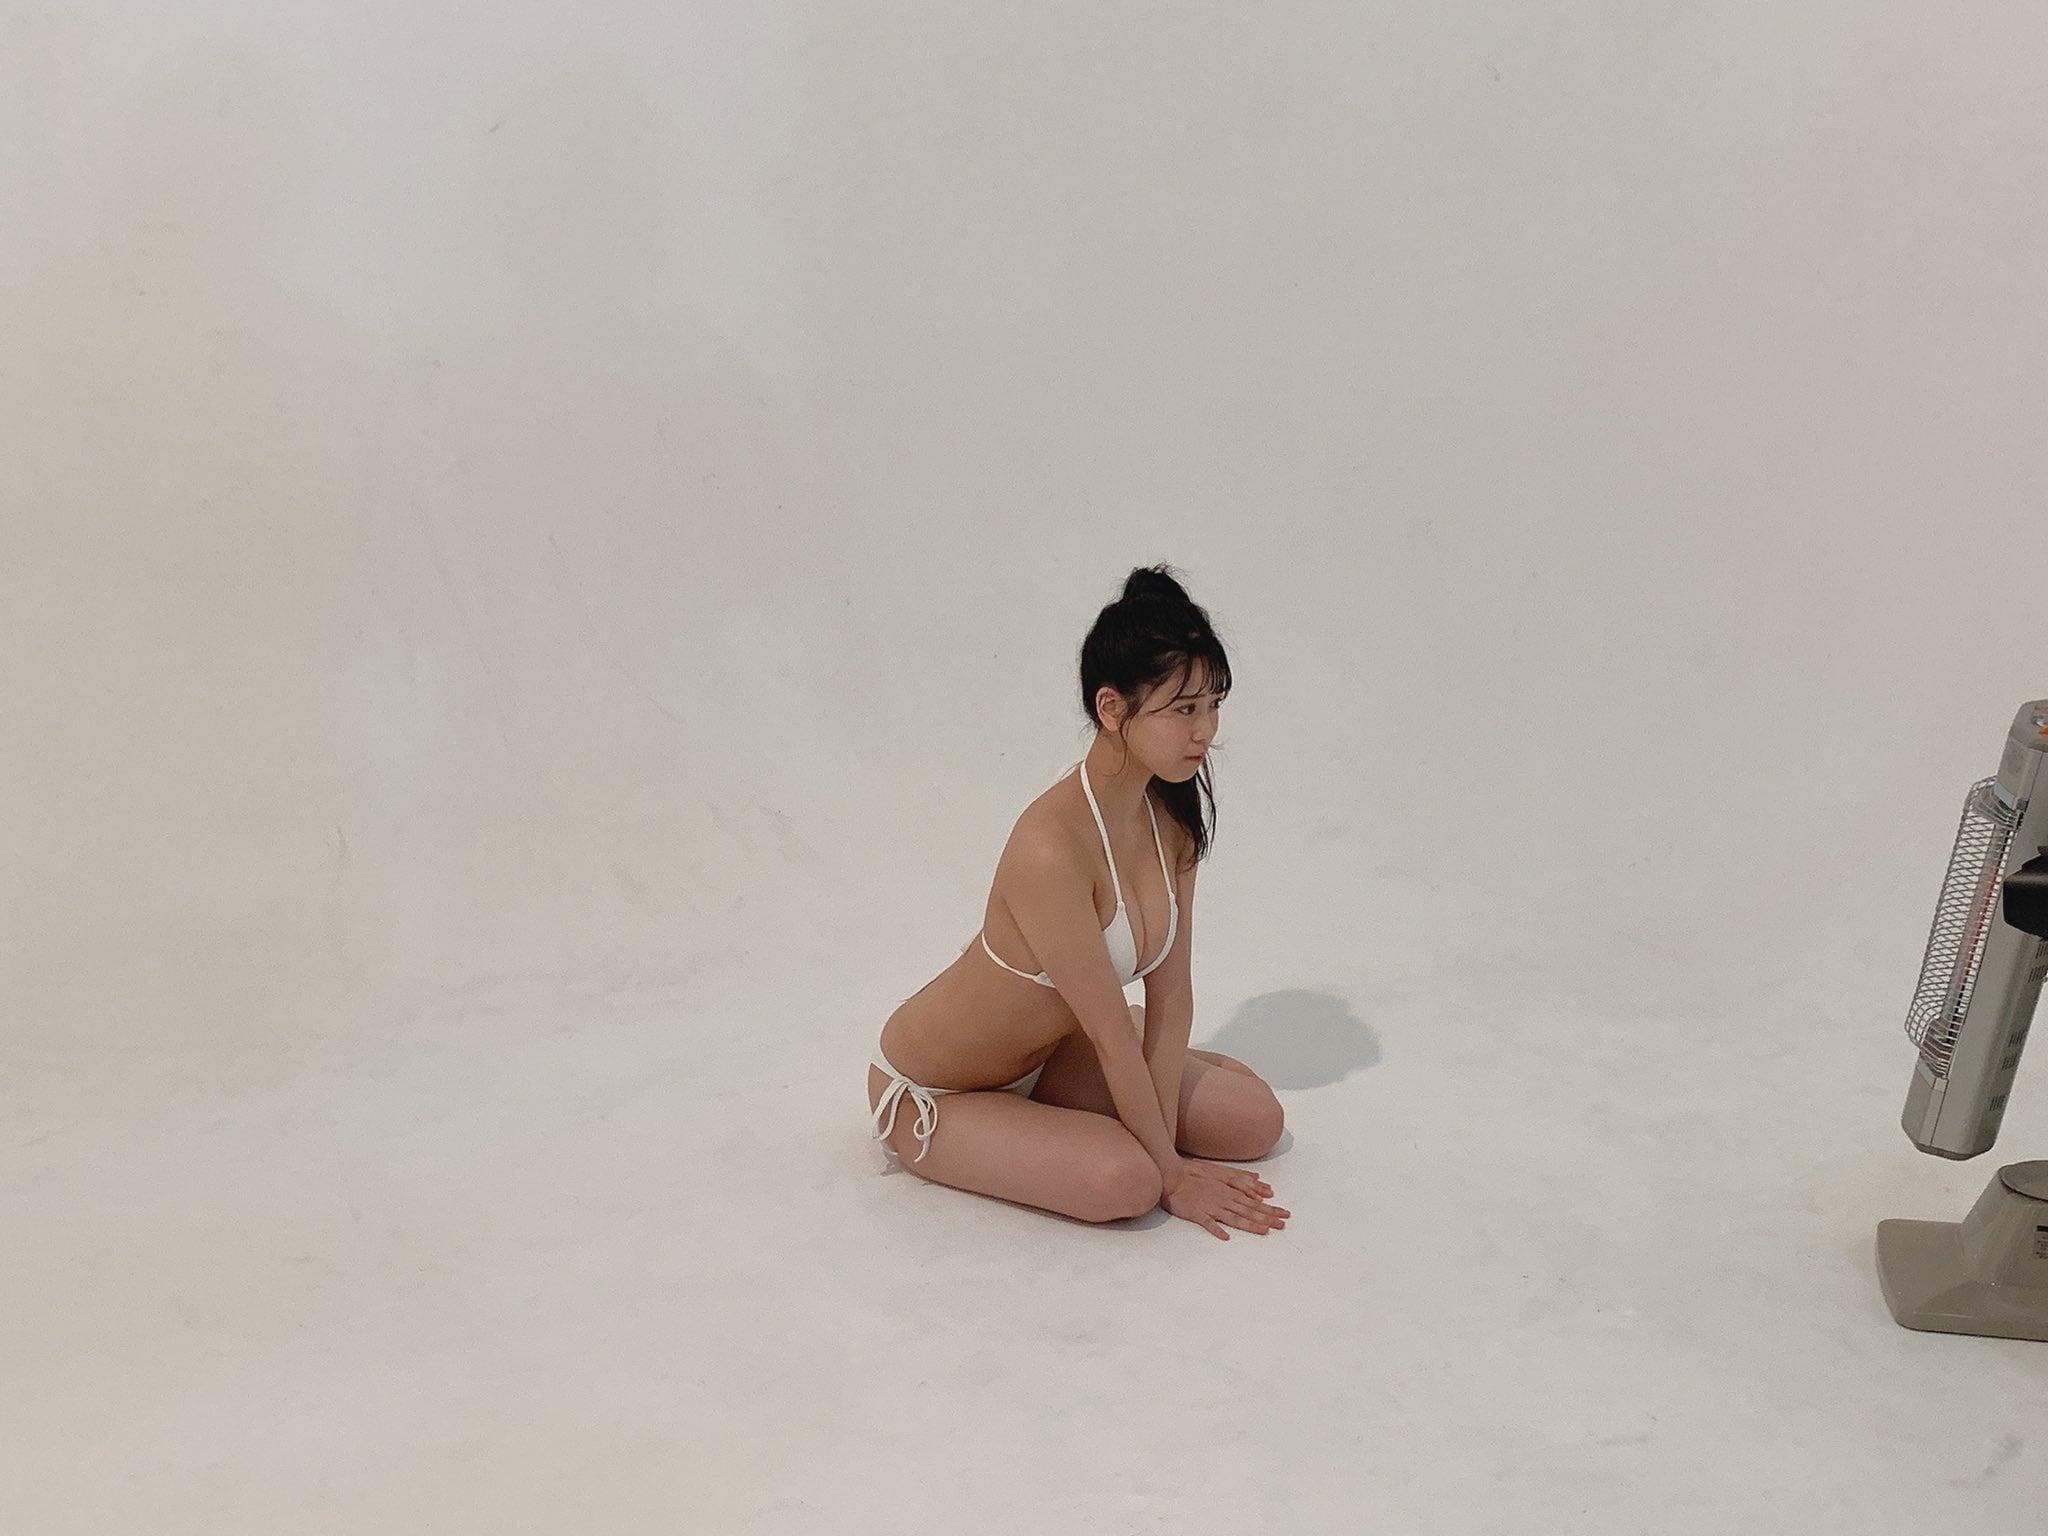 NMB48安田桃寧「美スタイルが映える白ビキニ…」水着グラビア撮影中のオフショットを公開【画像2枚】の画像002